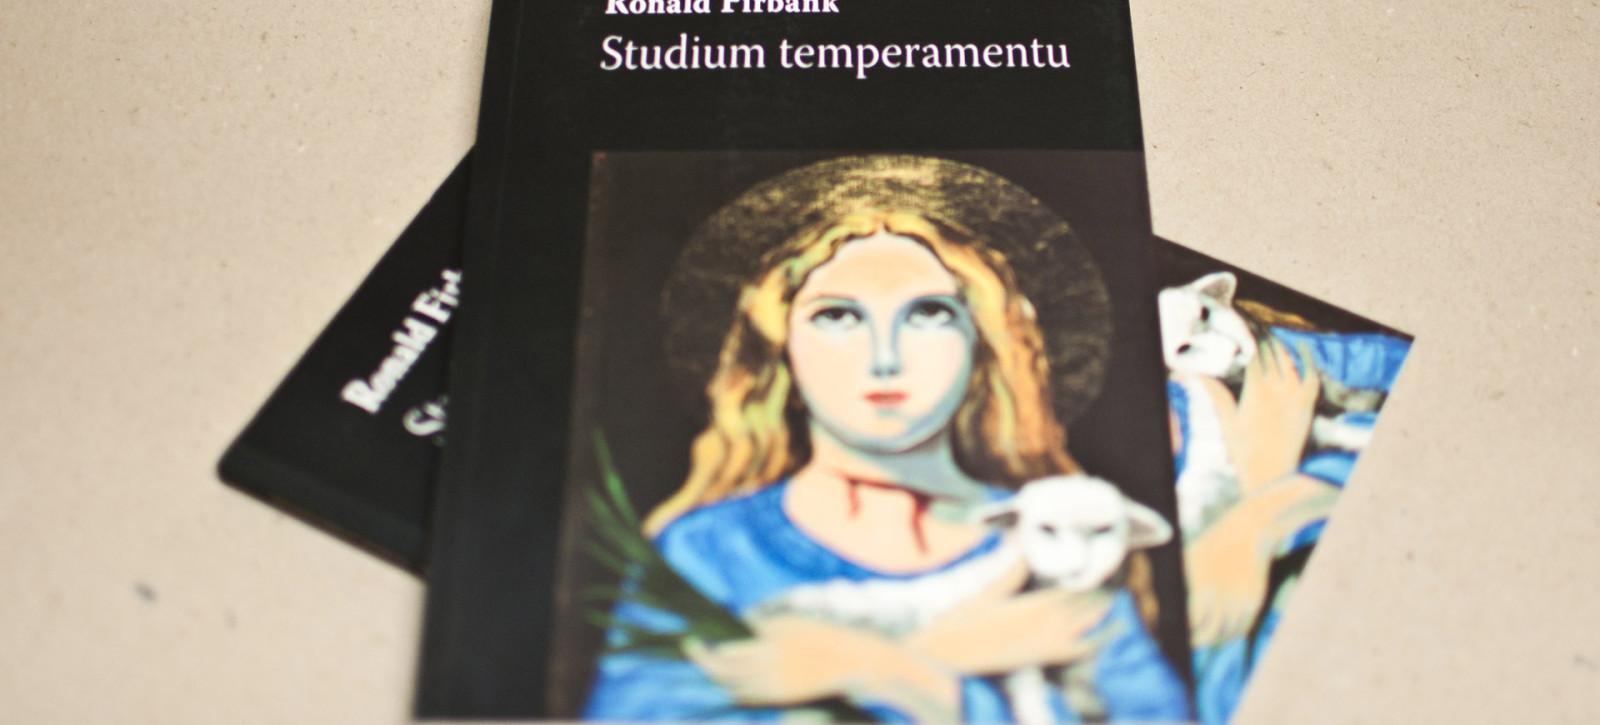 KSIAZKI_Studium-temperamentu